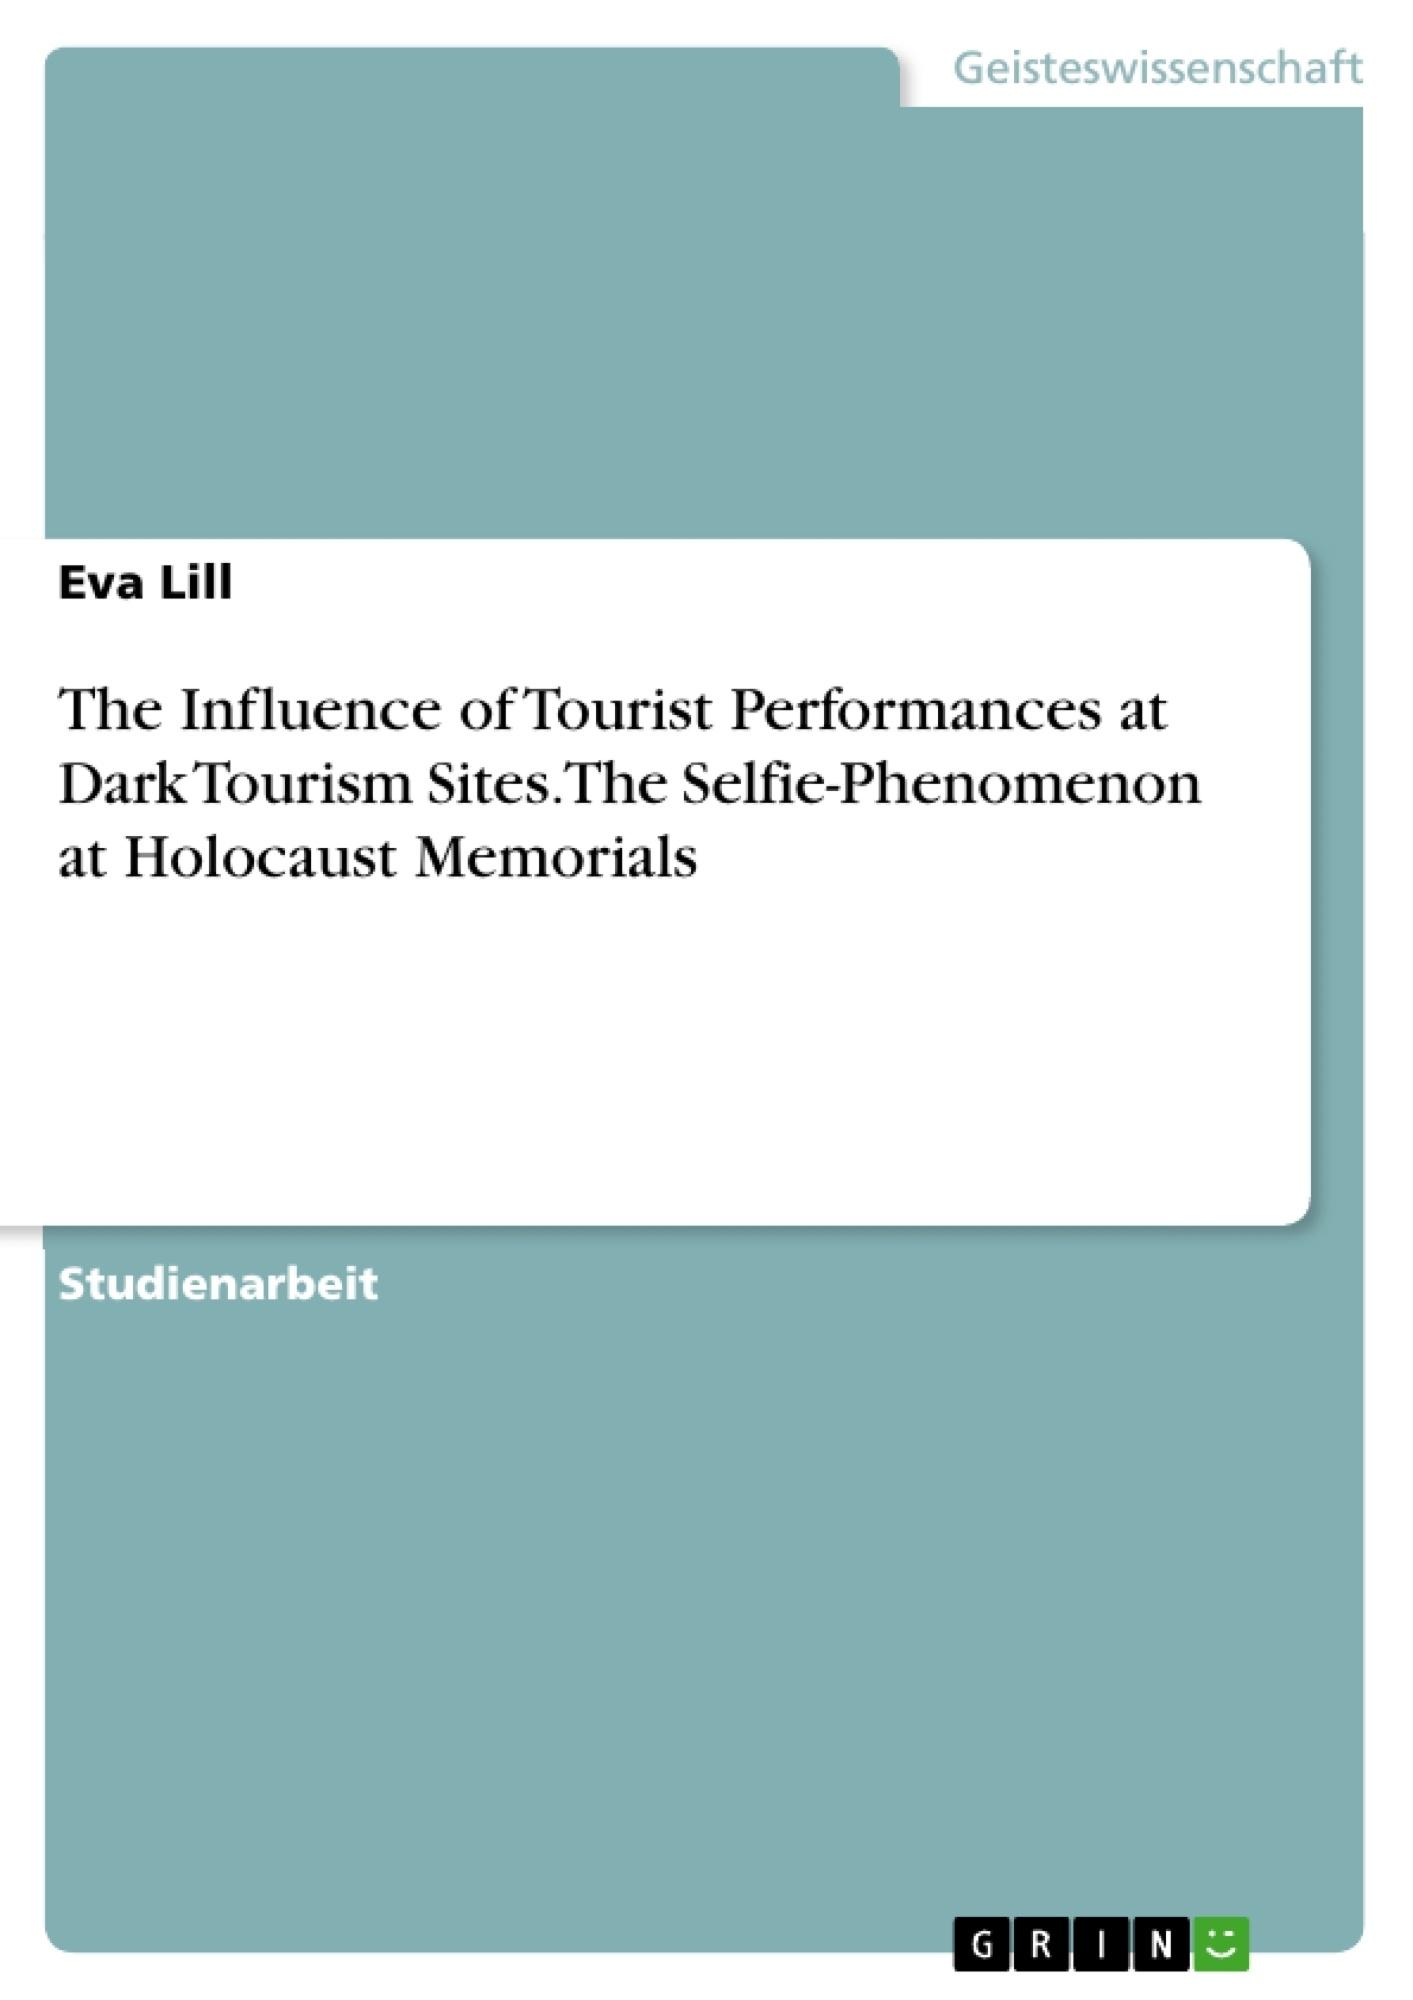 Titel: The Influence of Tourist Performances at Dark Tourism Sites. The Selfie-Phenomenon at Holocaust Memorials